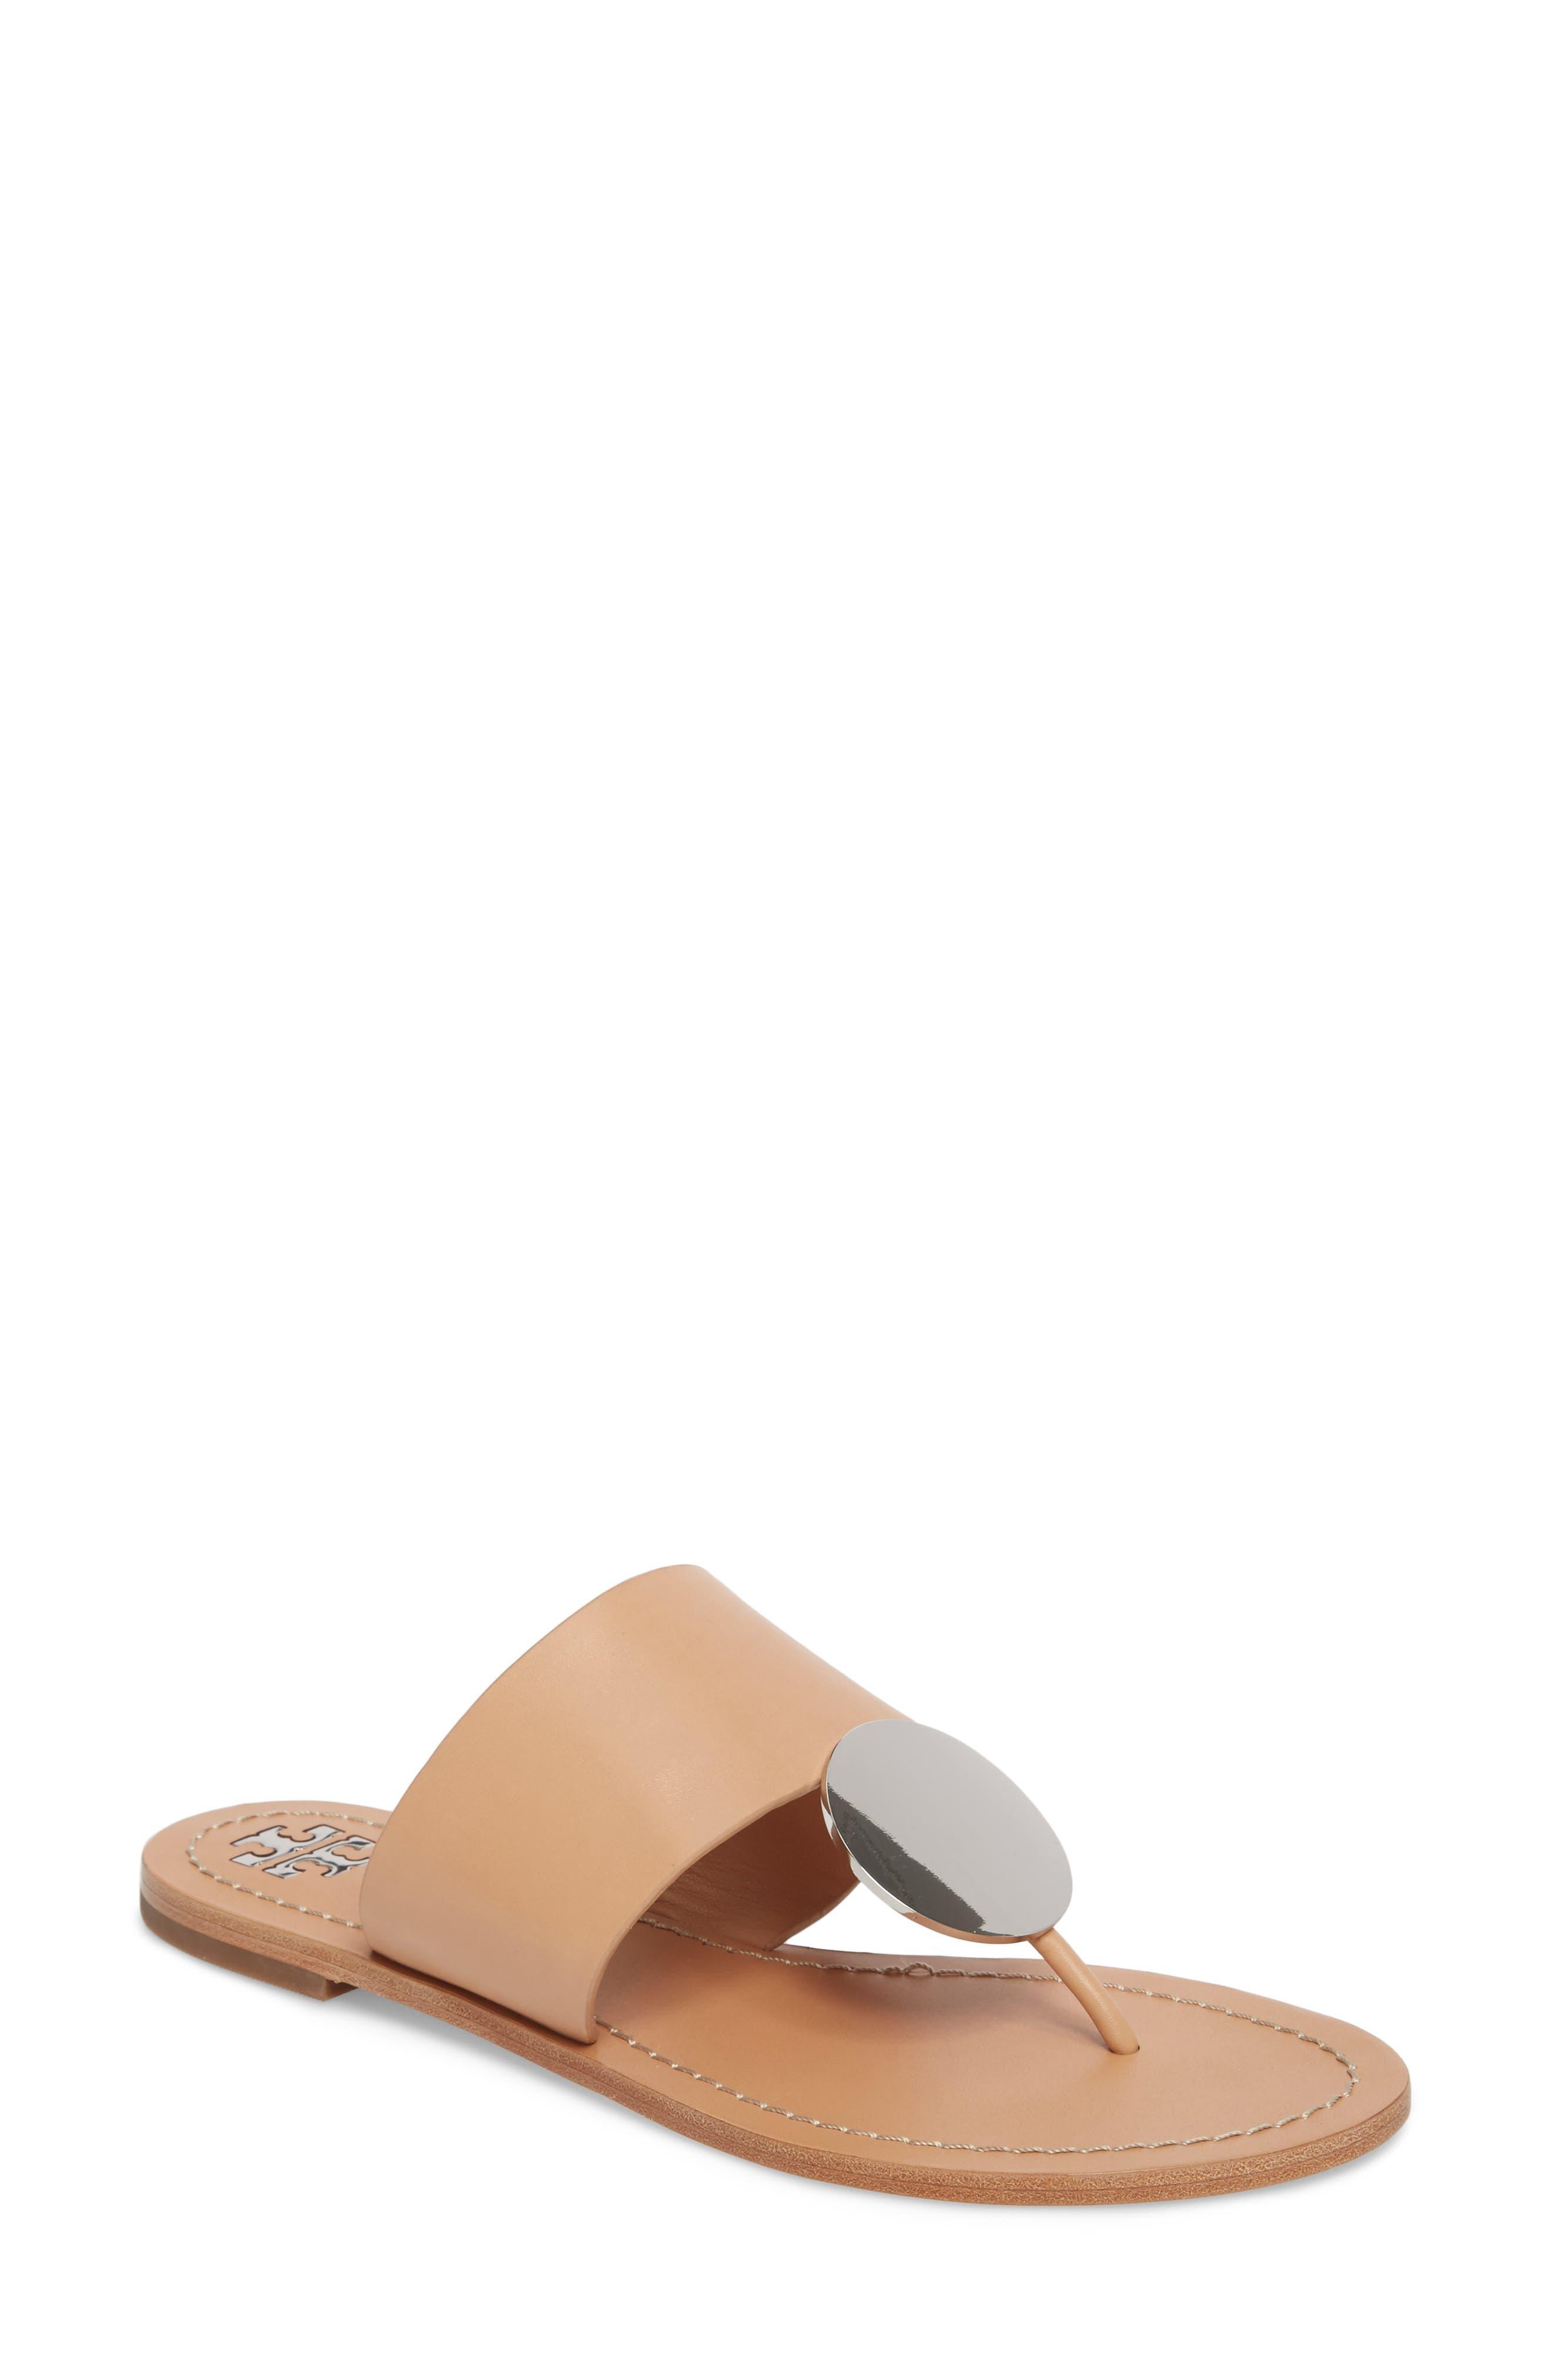 Patos Sandal,                         Main,                         color, Natural Vachetta/ Silver